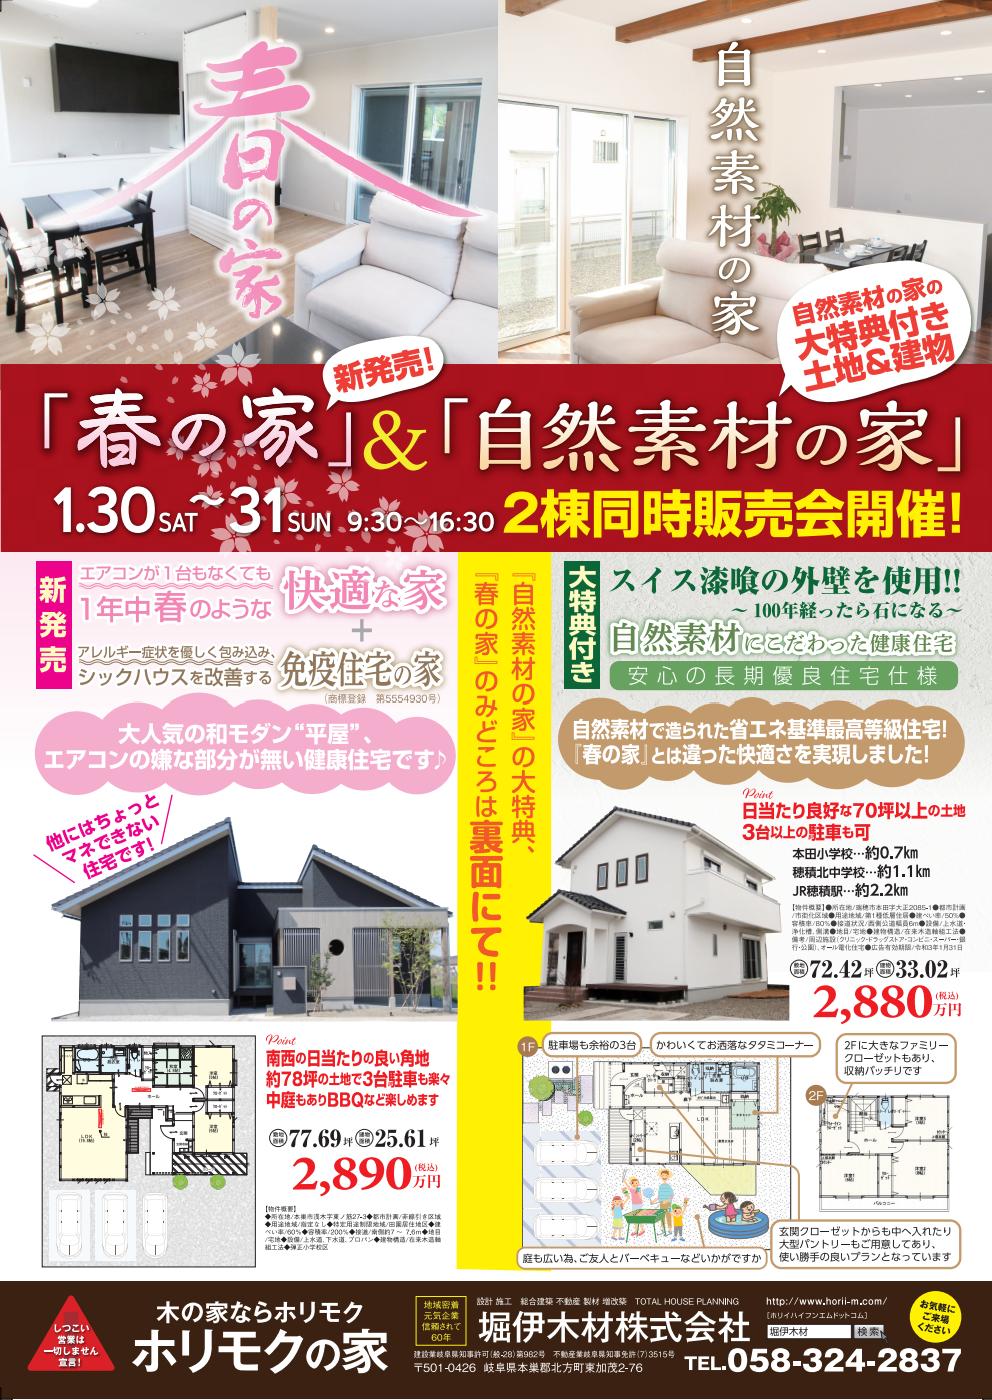 【終了】「春の家」&「自然素材の家」2棟同時販売会開催★